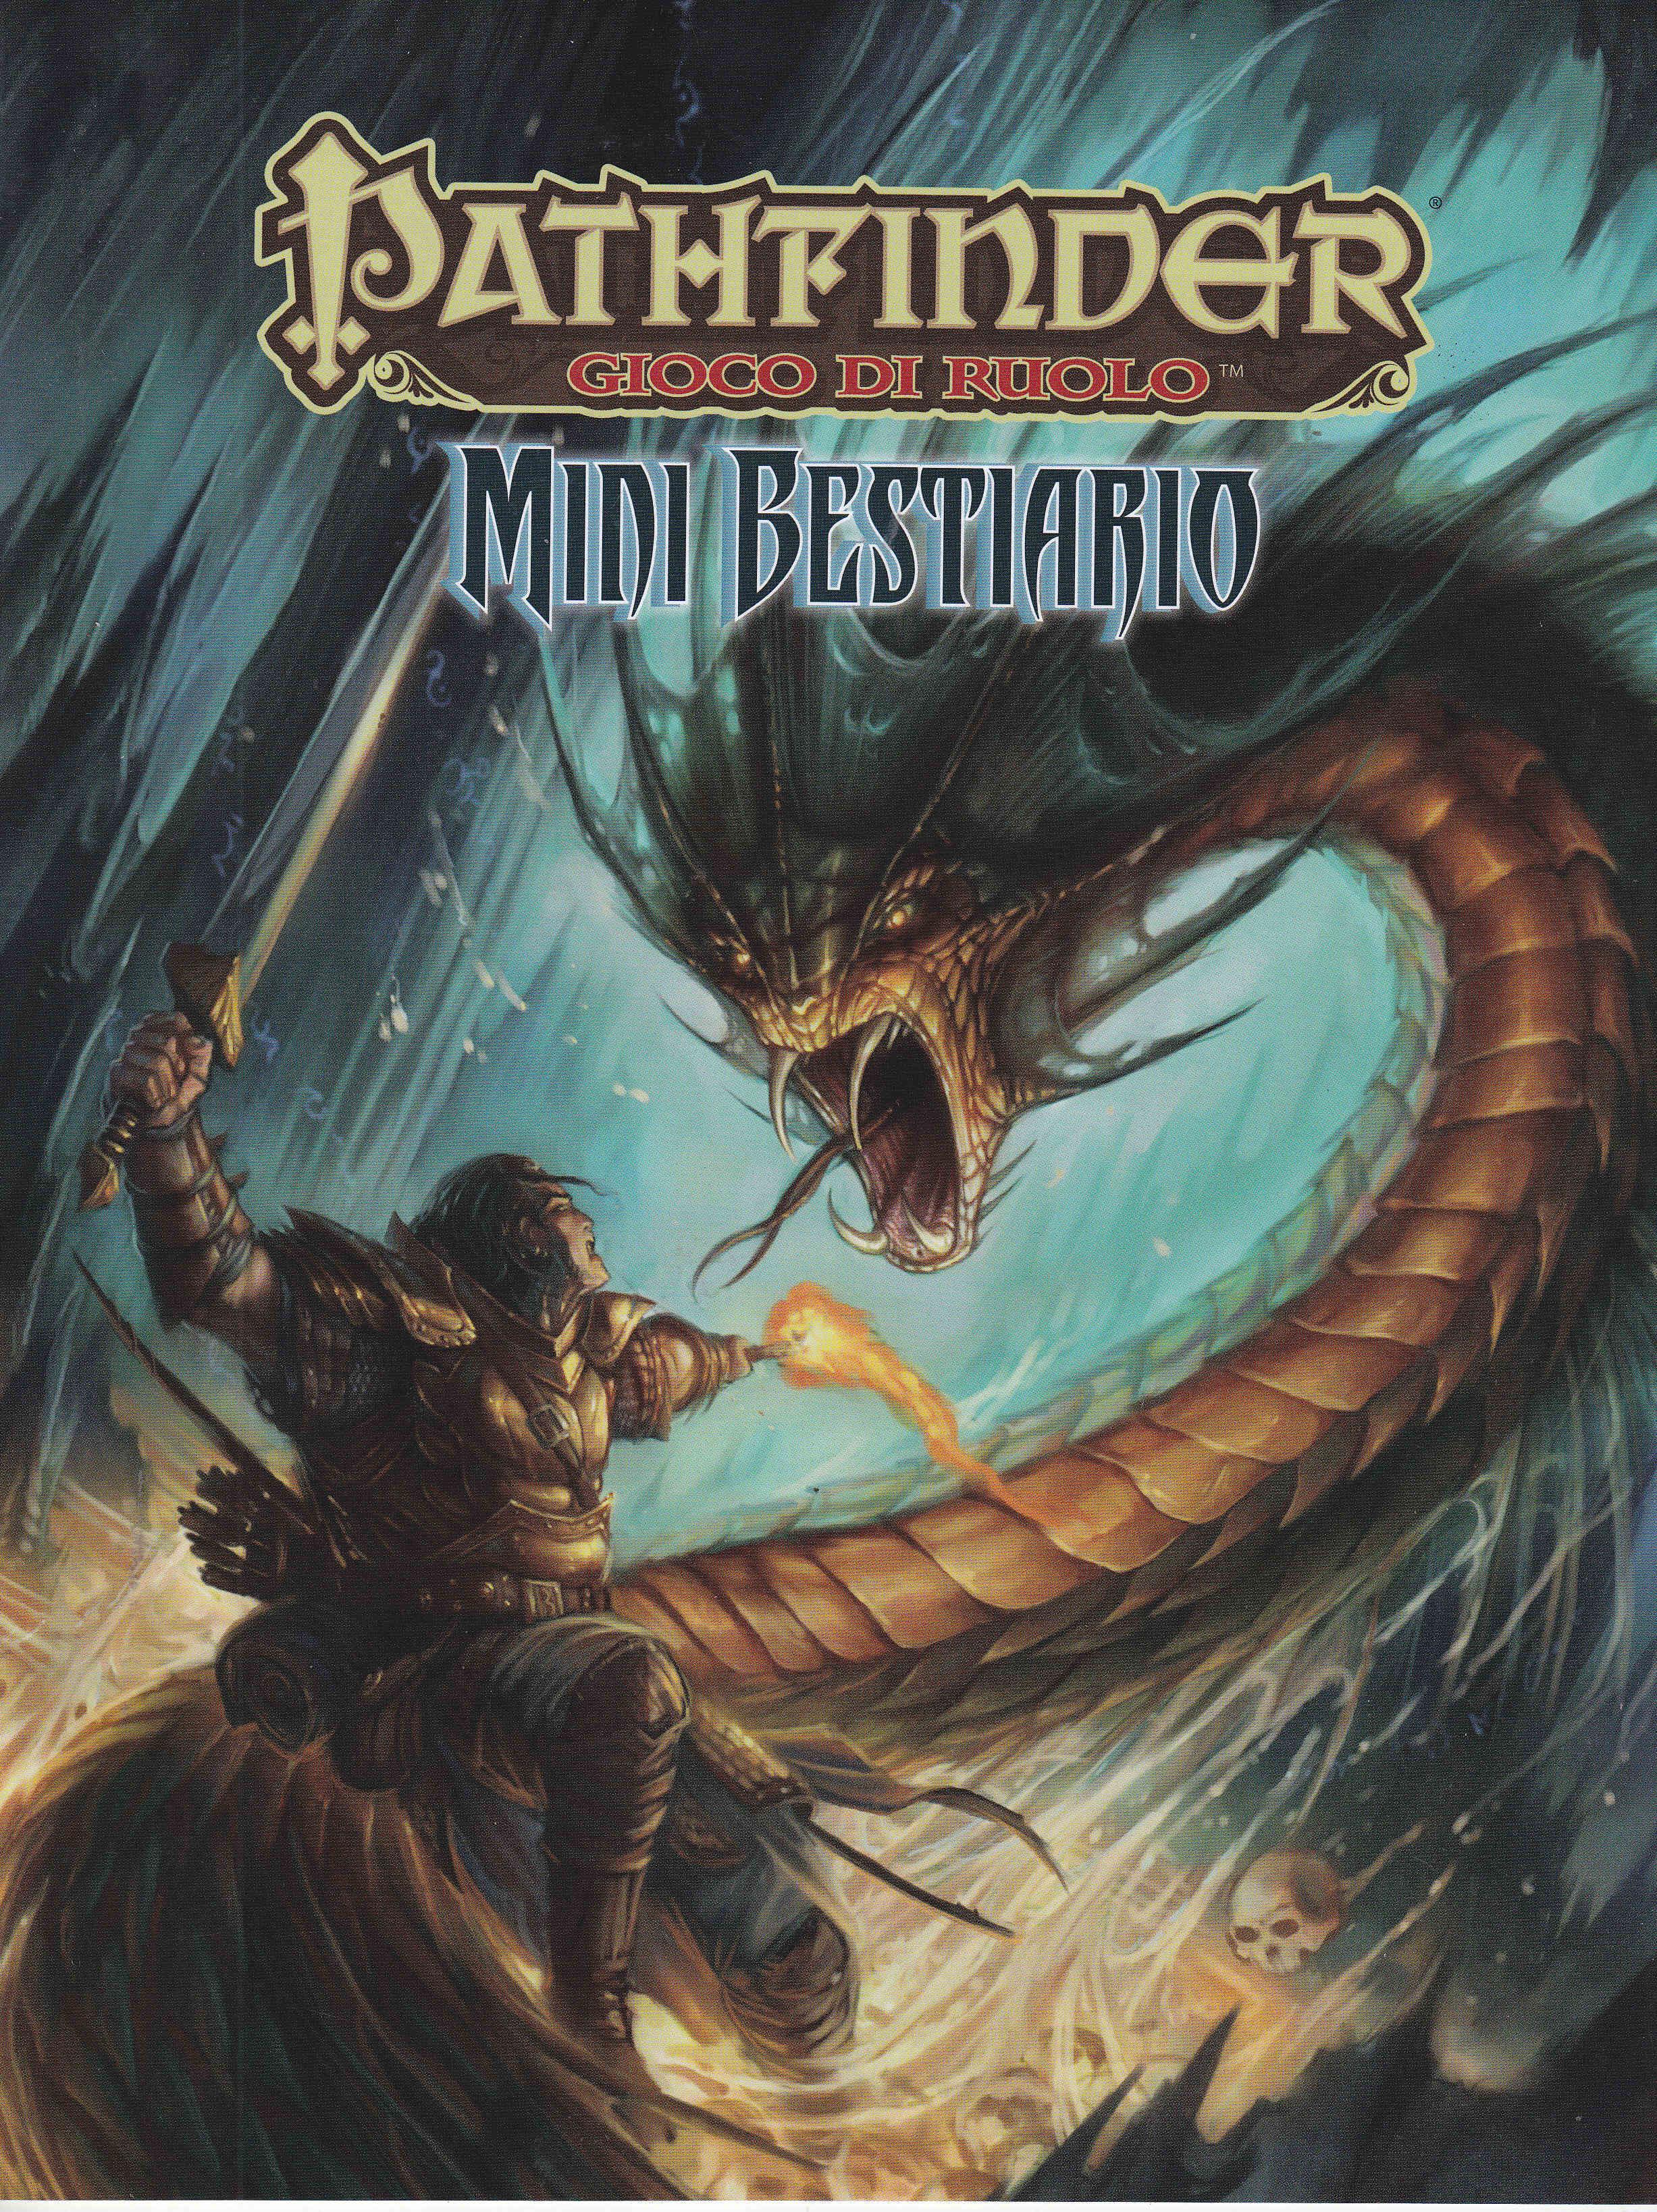 PATHFINDER - MINI BESTIARIO